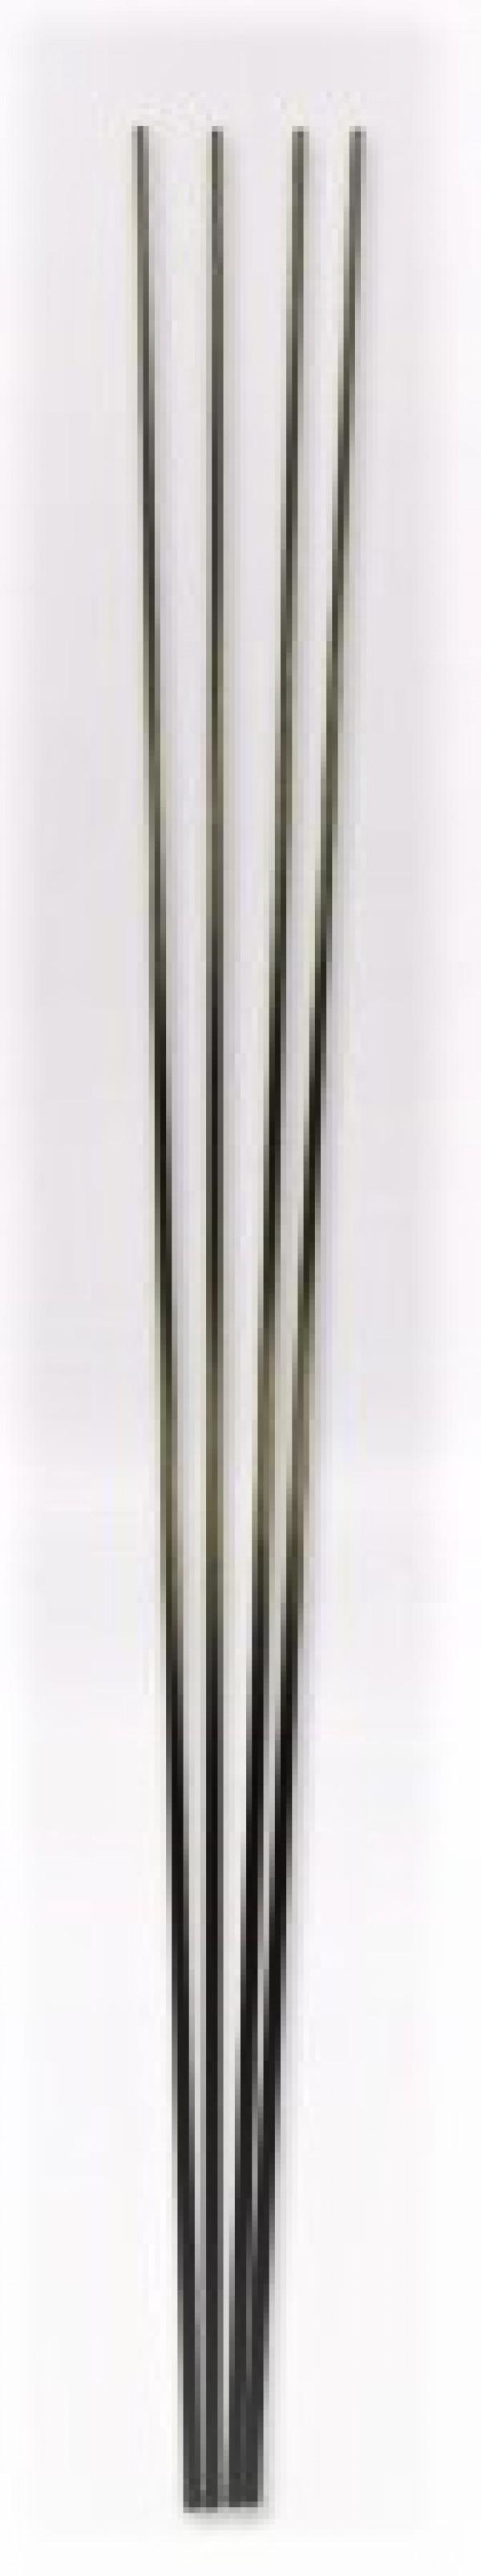 Rezervni deo-Karbon sekcija III deo 9.5mm x 1.1m